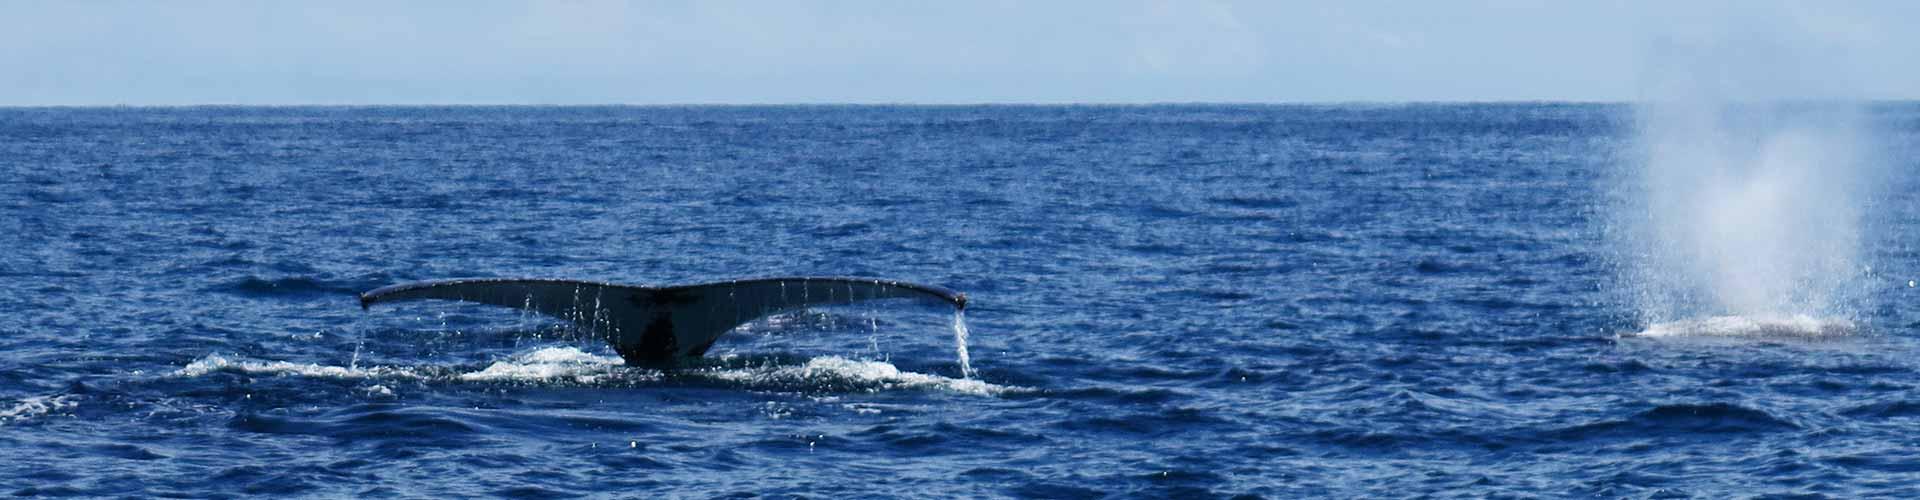 Manta Diving - >Biologia marina - Balene